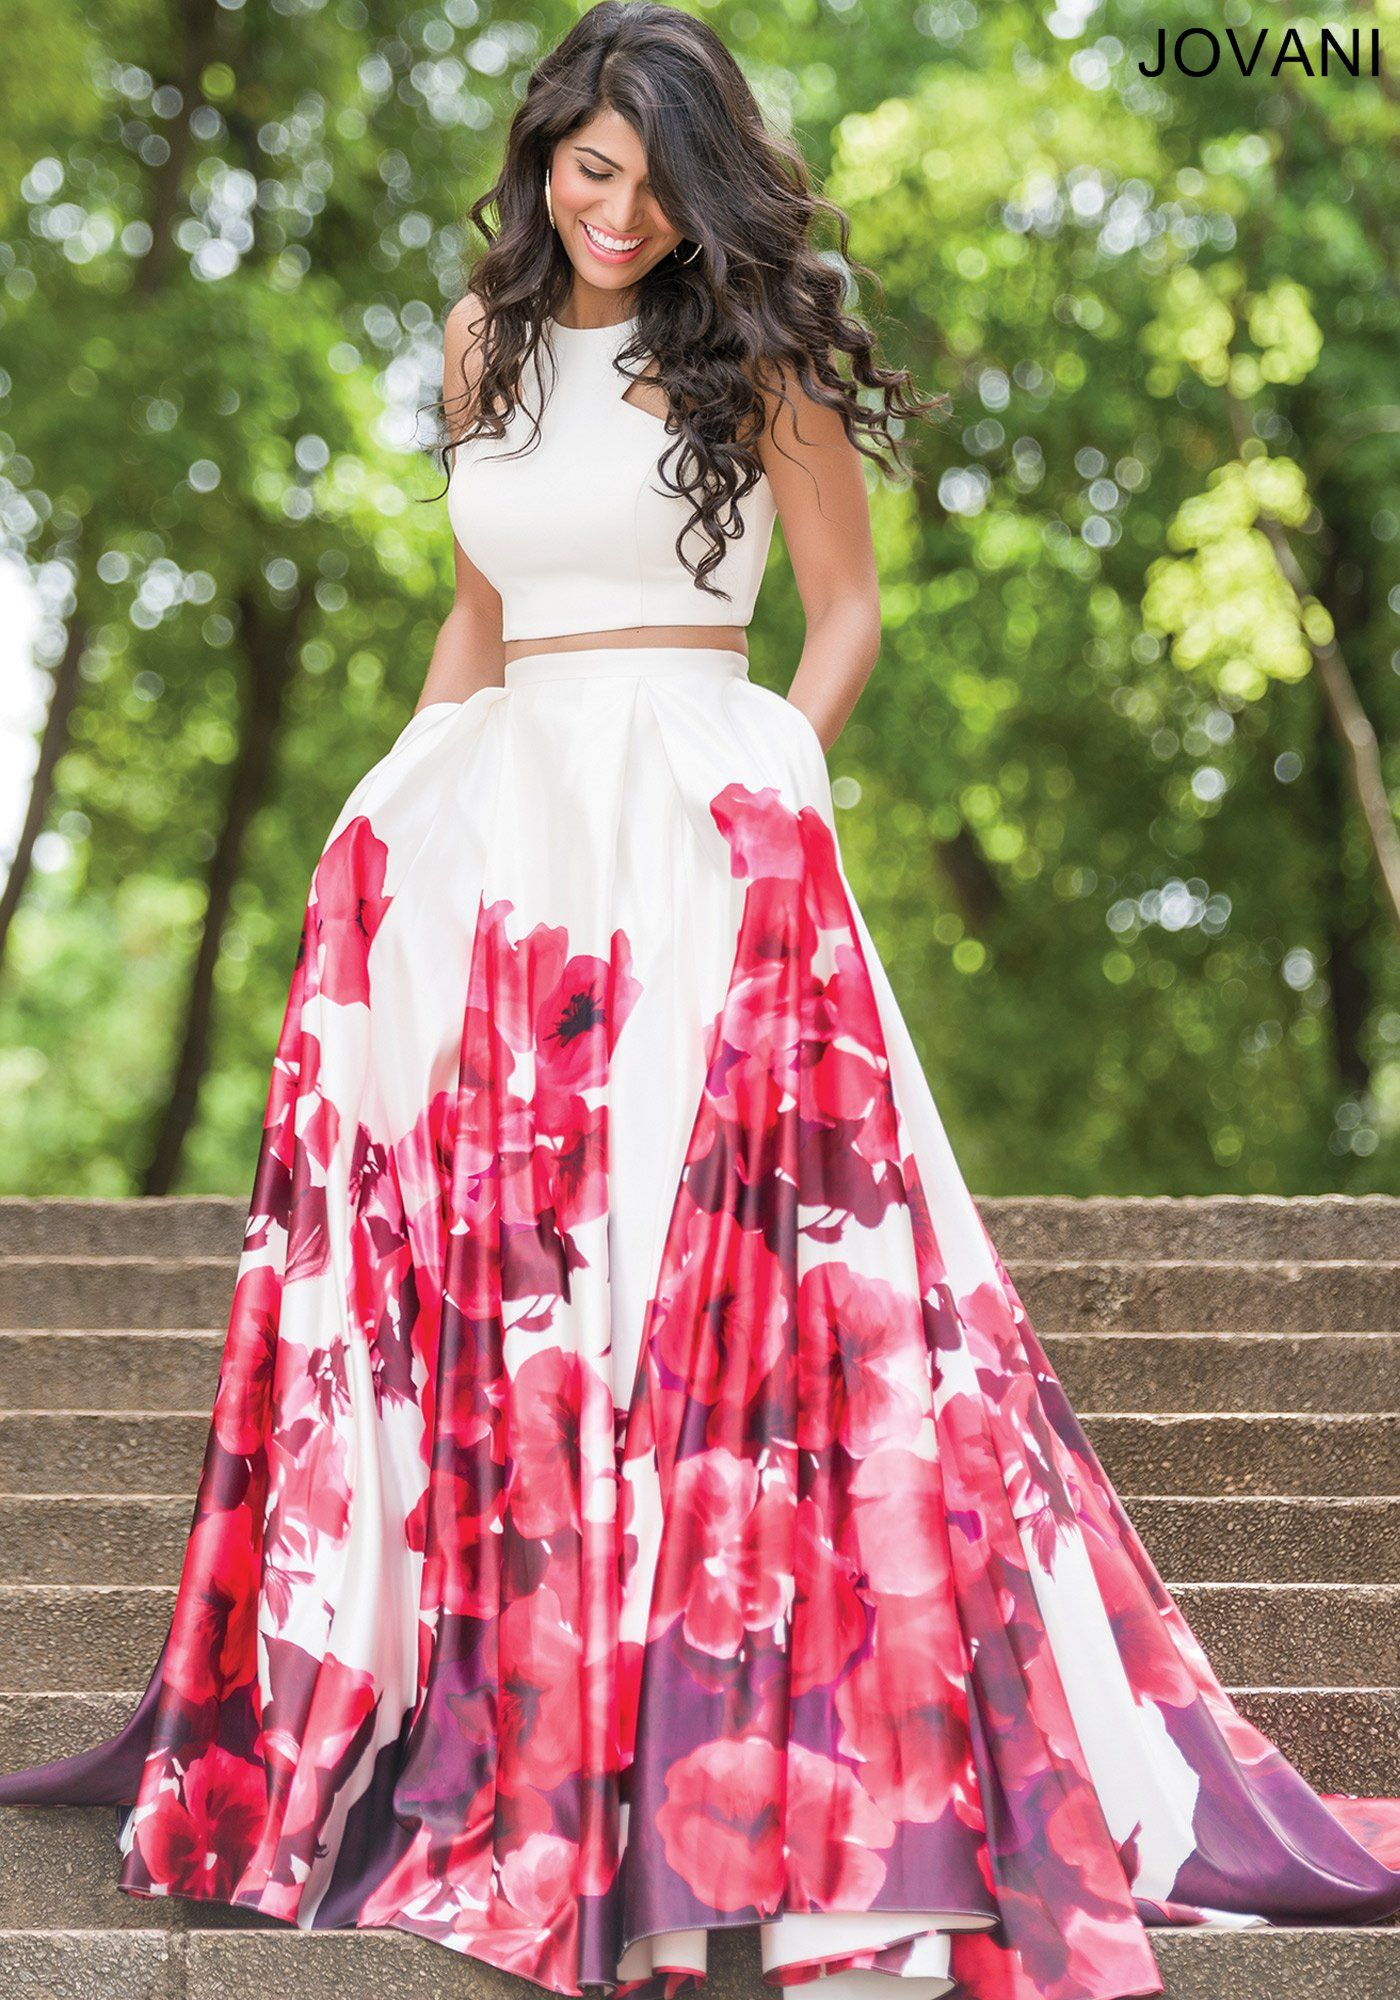 White/Multi Sleeveless Satin A-line Prom Dress 34028 | vestido de ...